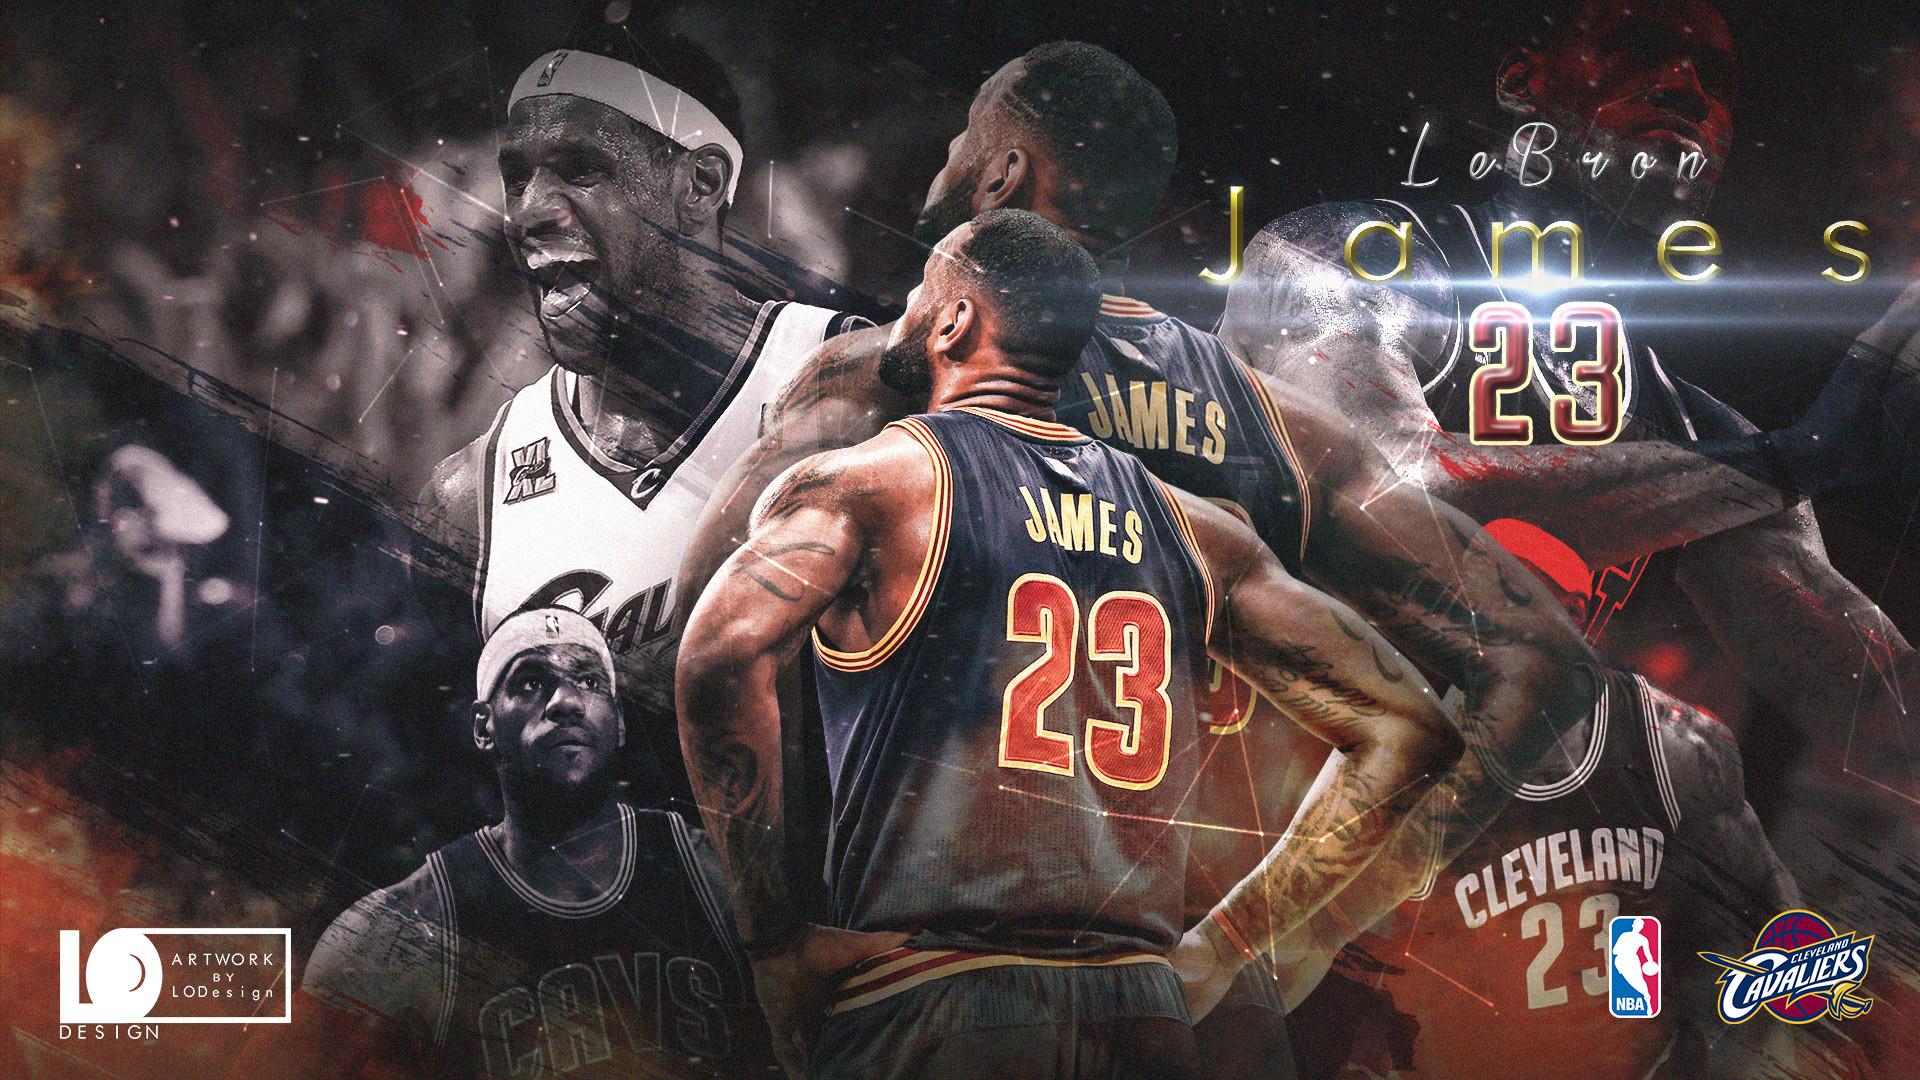 1920x1080 LeBron James 2017 Playoffs Wallpaper Download 1920x1200